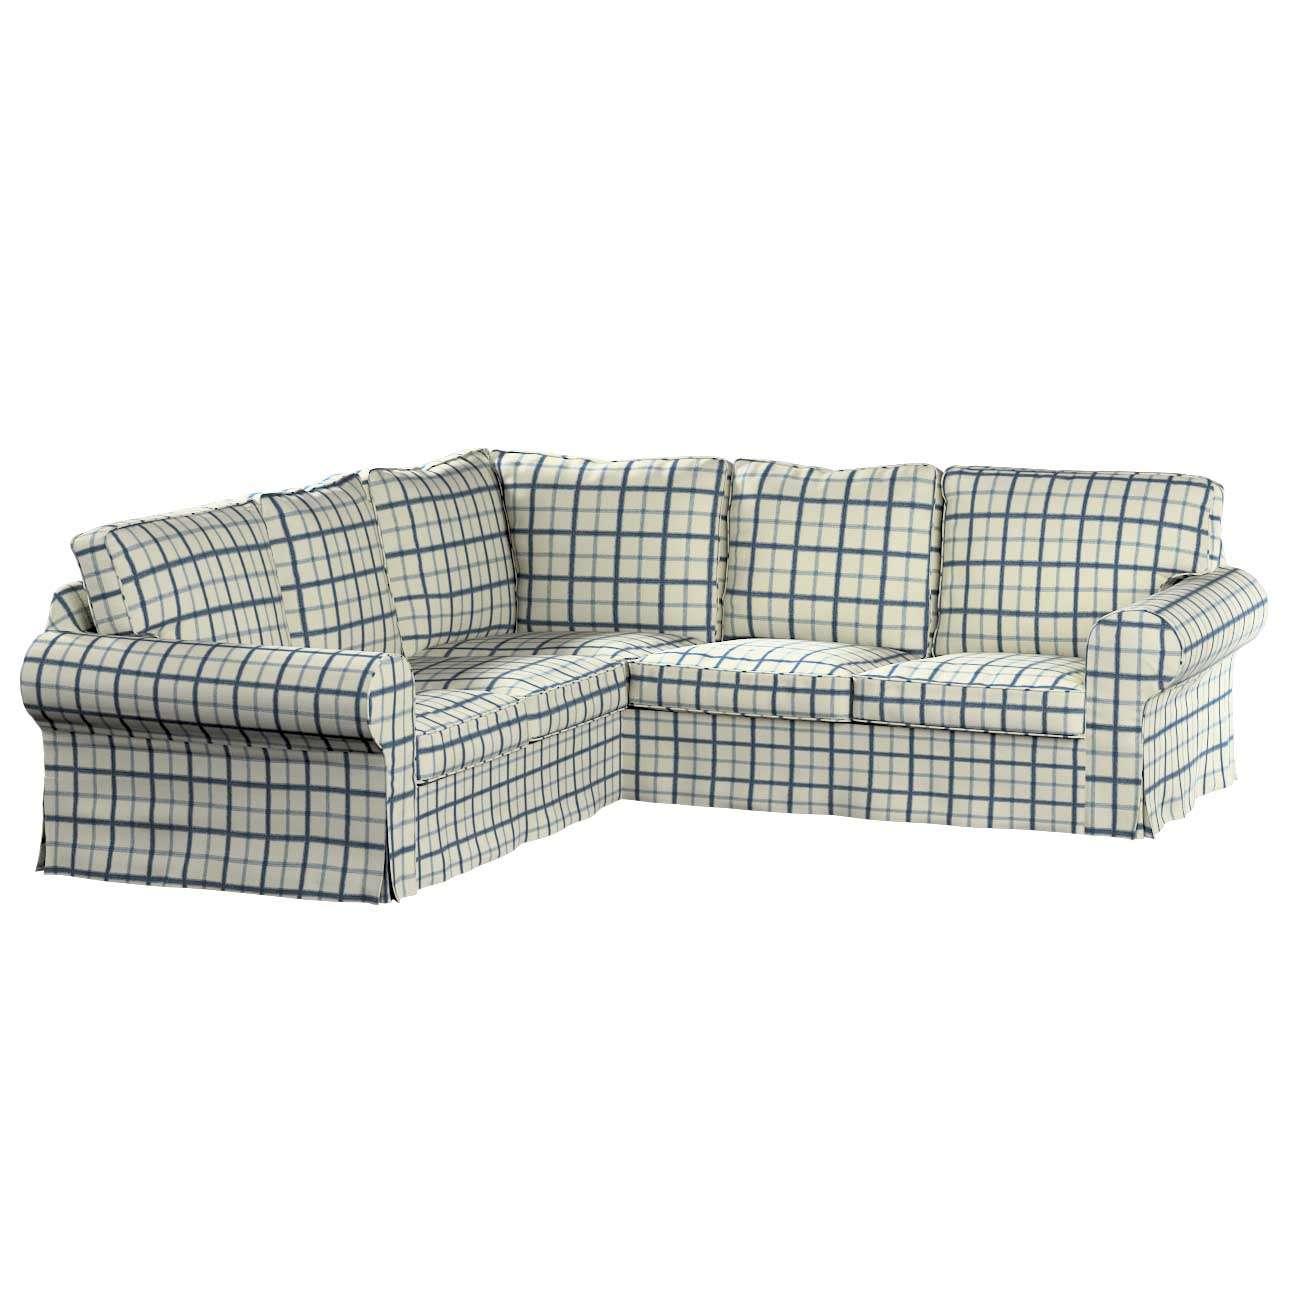 Ektorp kampinė sofa Ektorp kampinė sofa kolekcijoje Avinon, audinys: 131-66